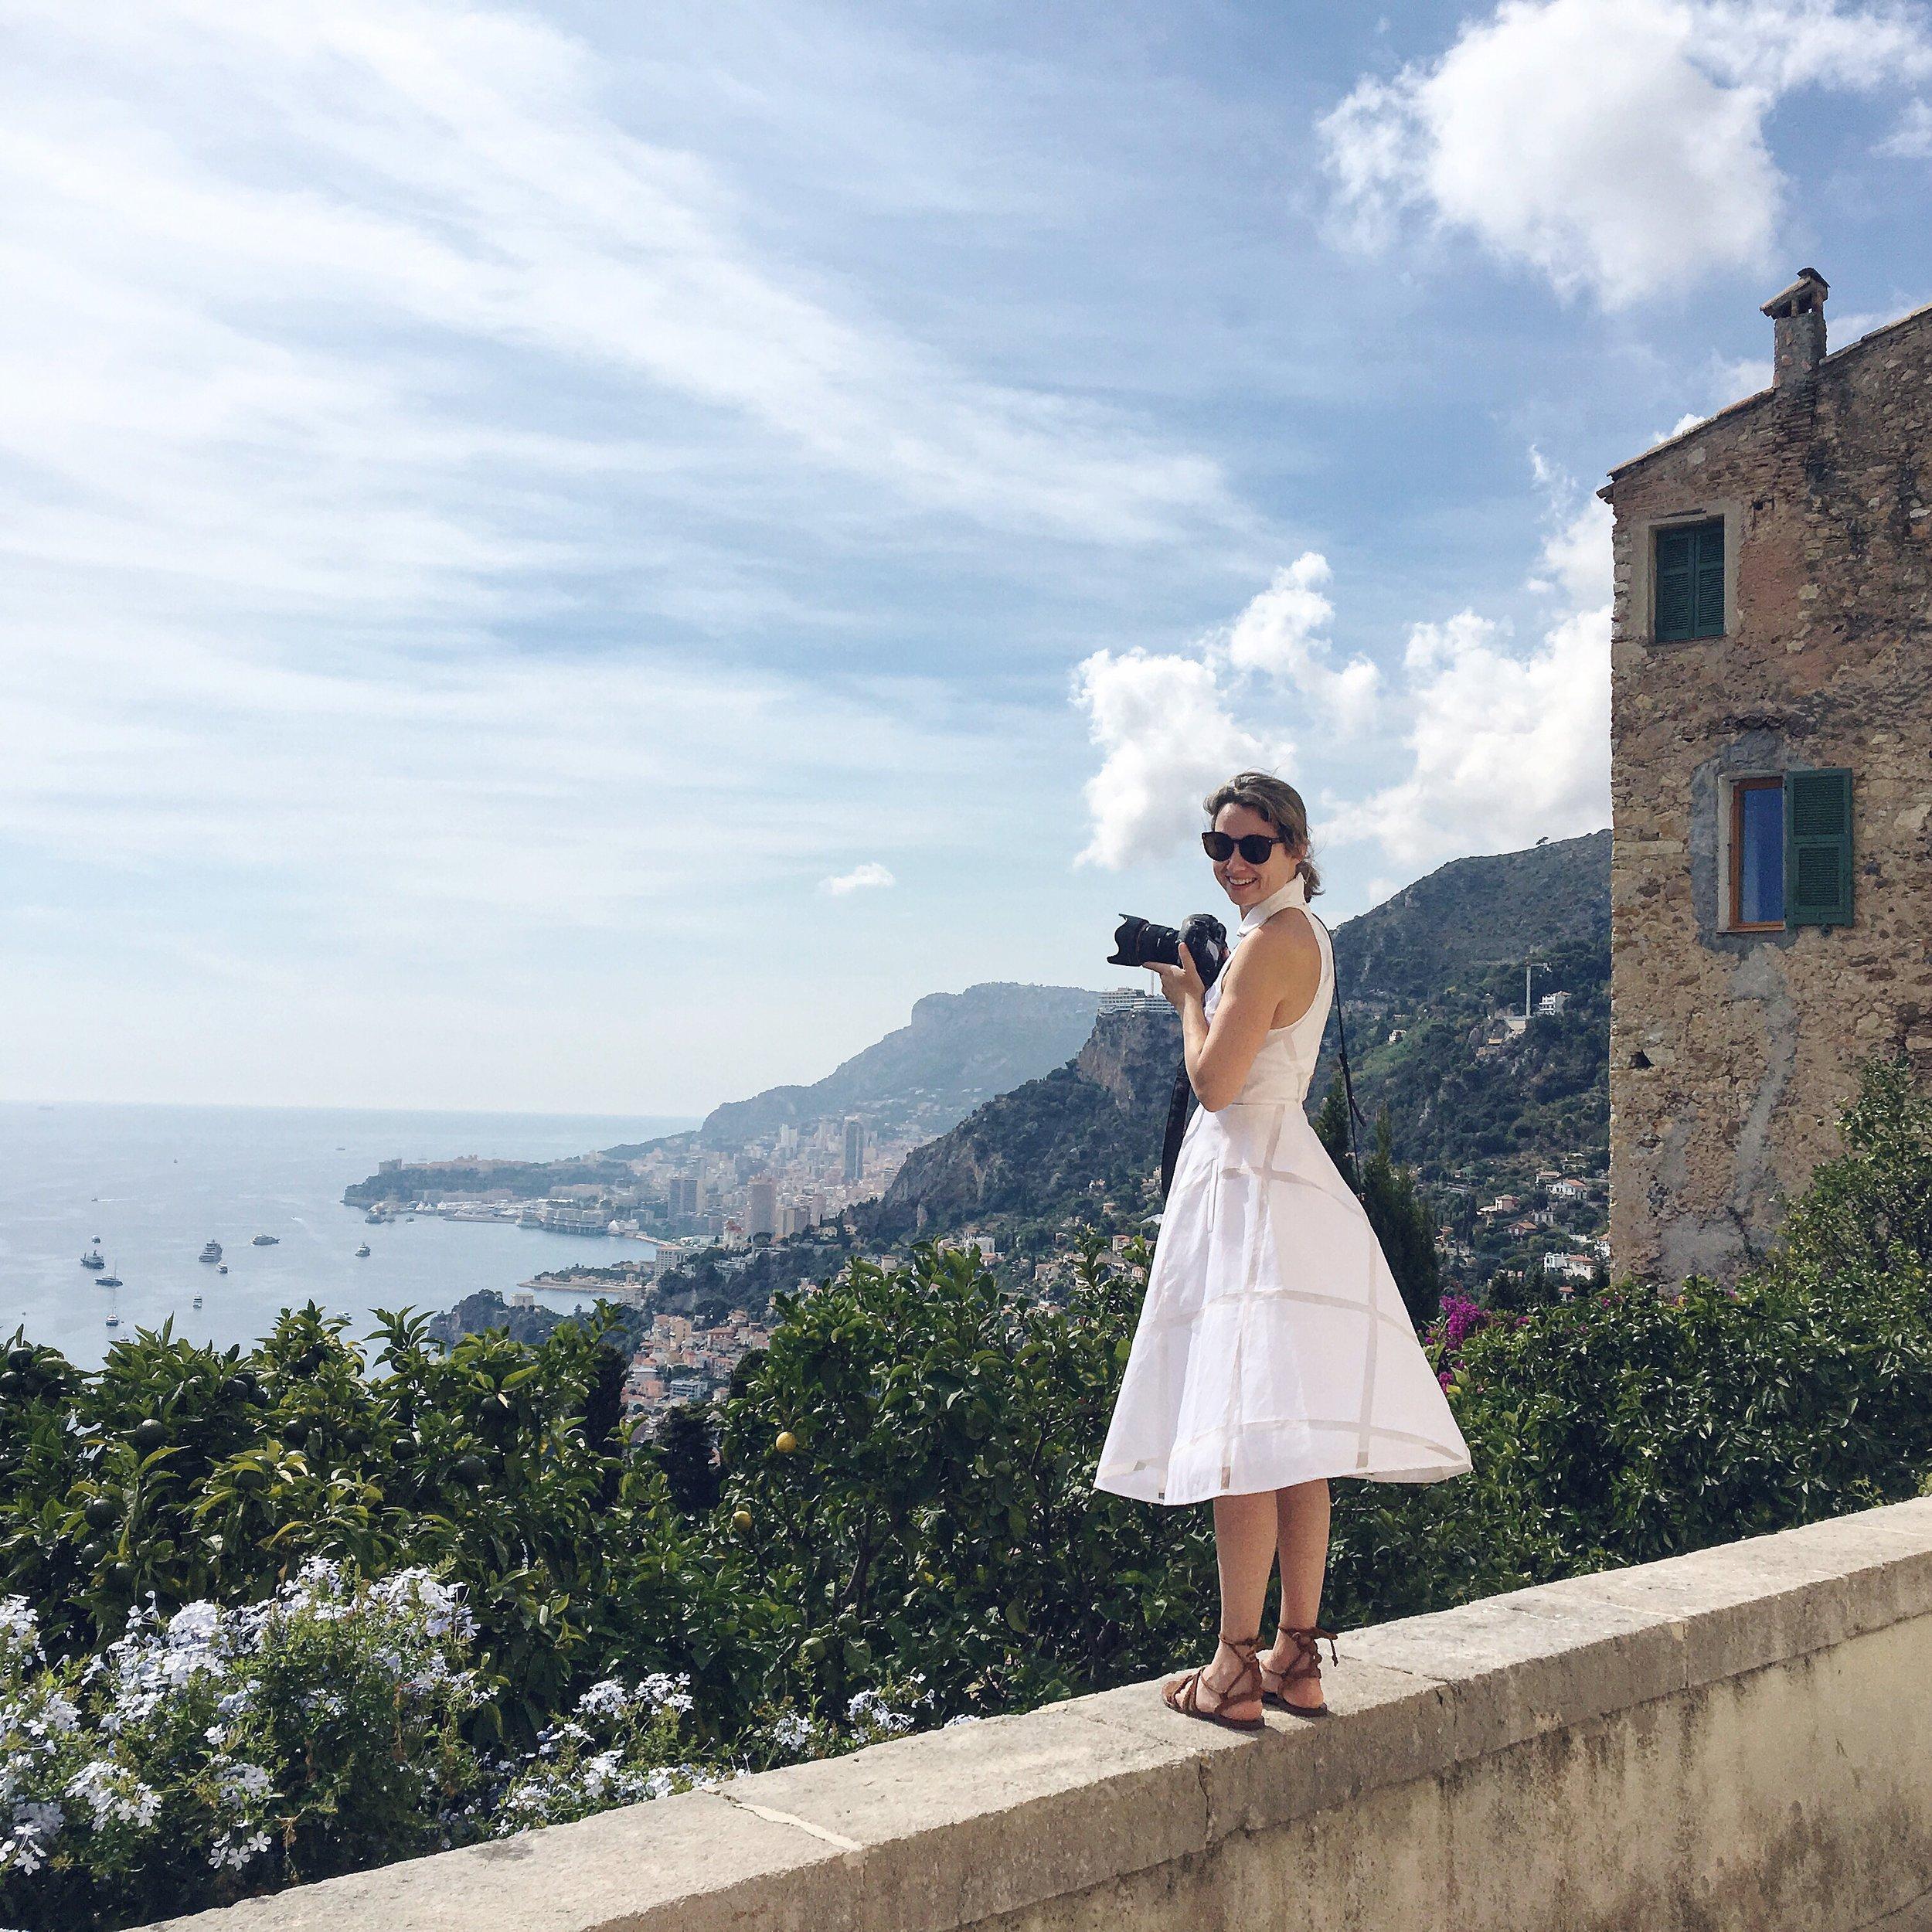 Lyndel & views of Monte Carlo Cote D'Azure France Road Trip